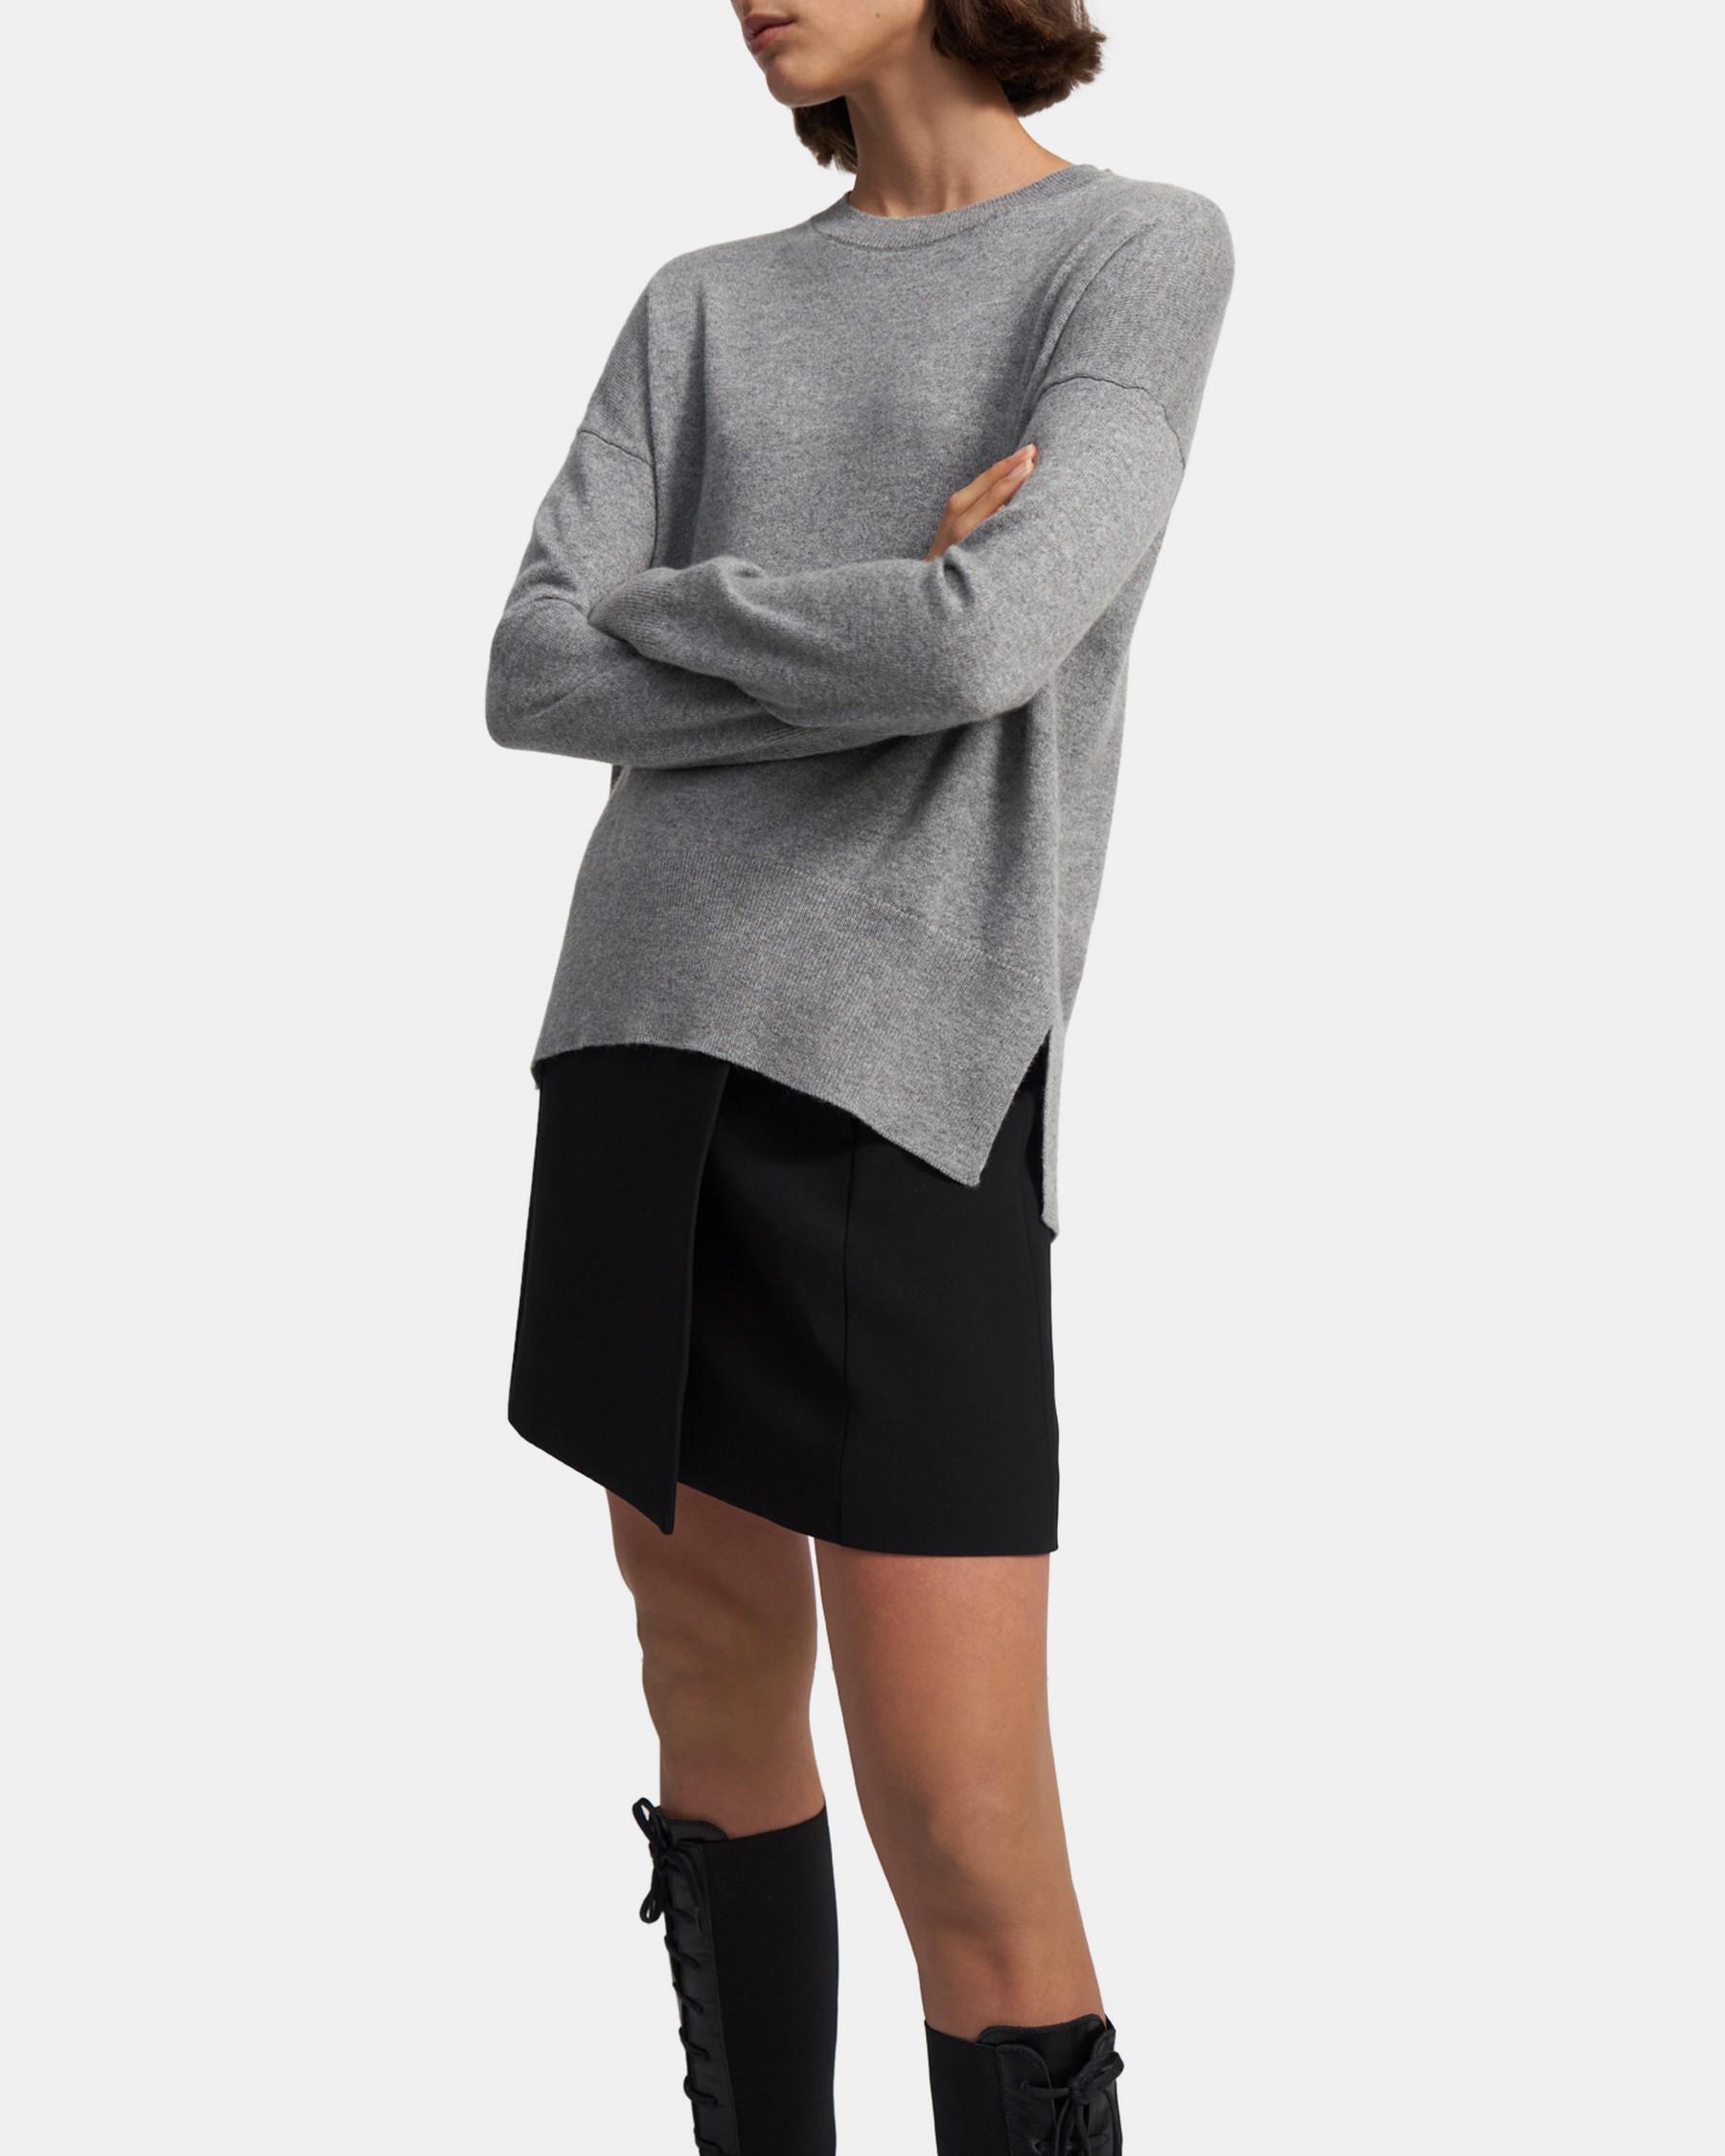 Karenia Sweater in Cashmere   Theory